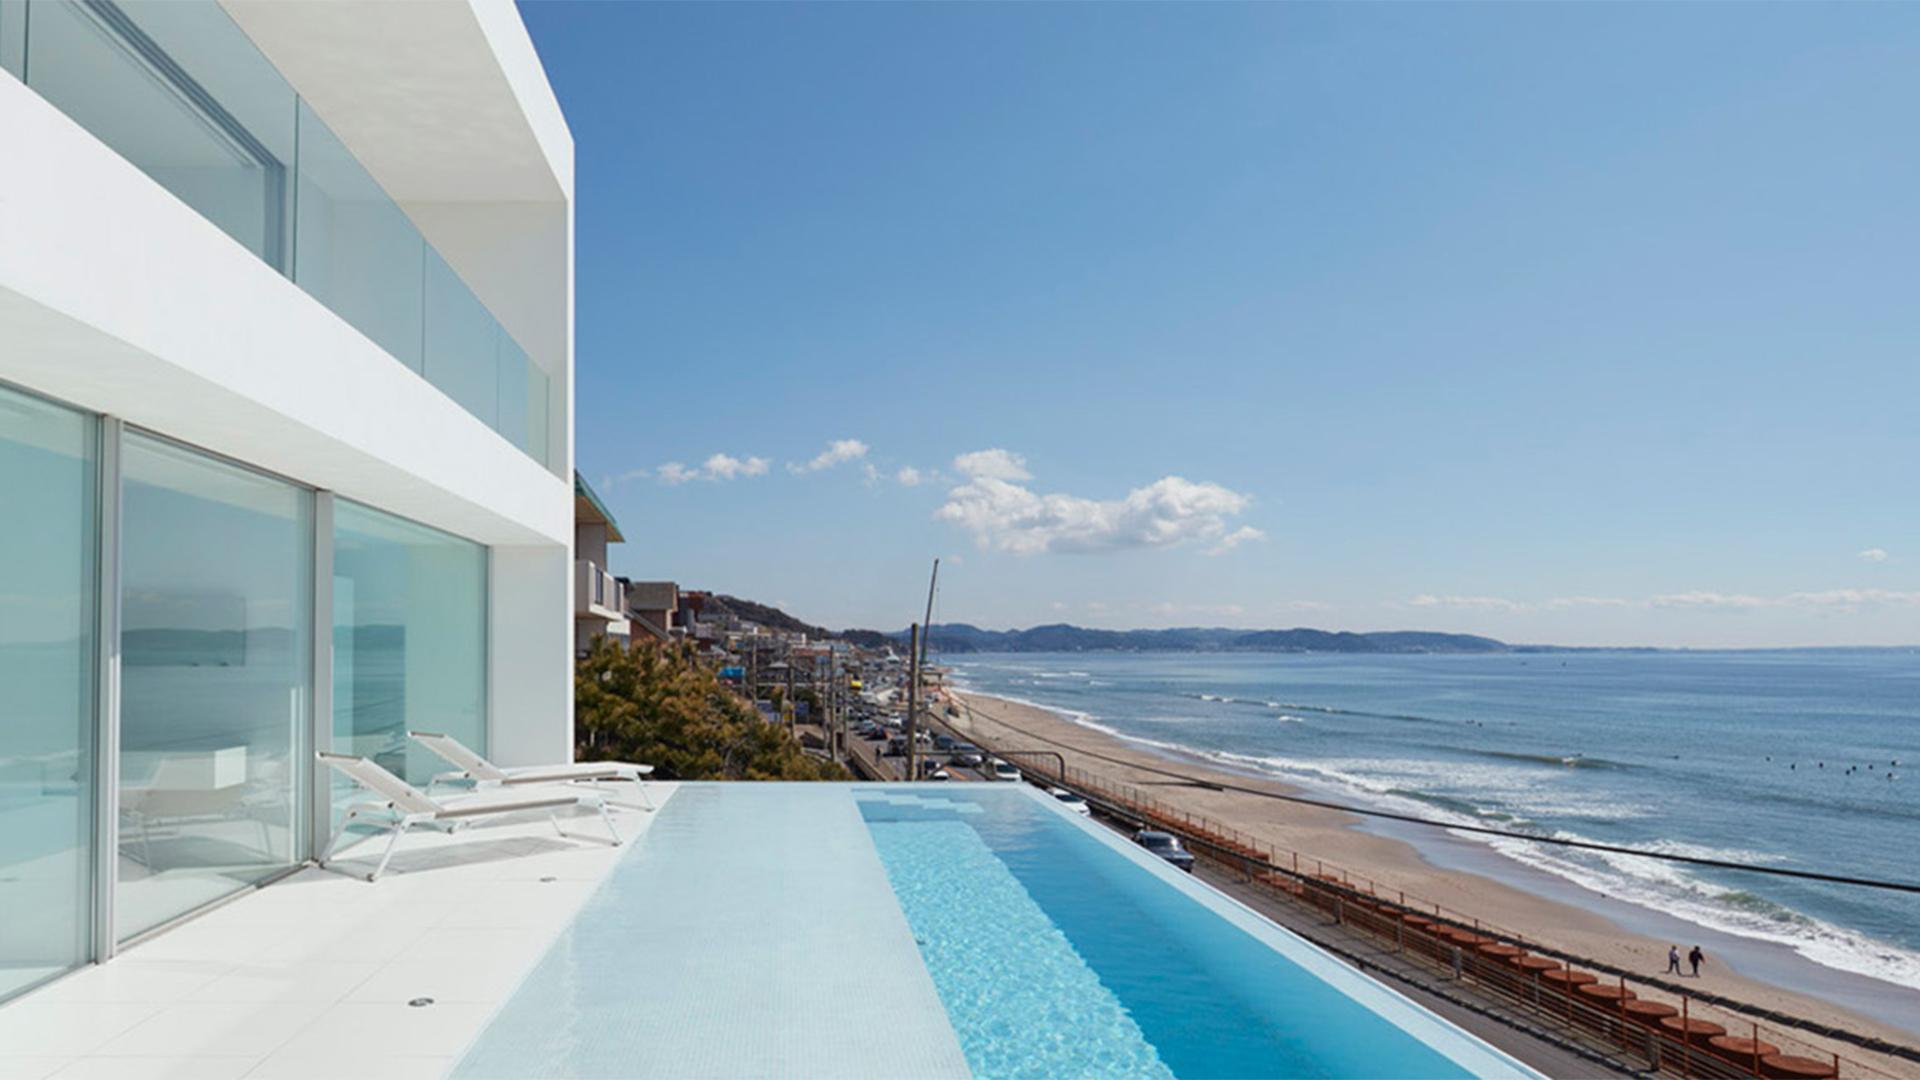 Casas de ensue o idealista news for Casa de lujo minimalista y espectacular con piscina por a cero